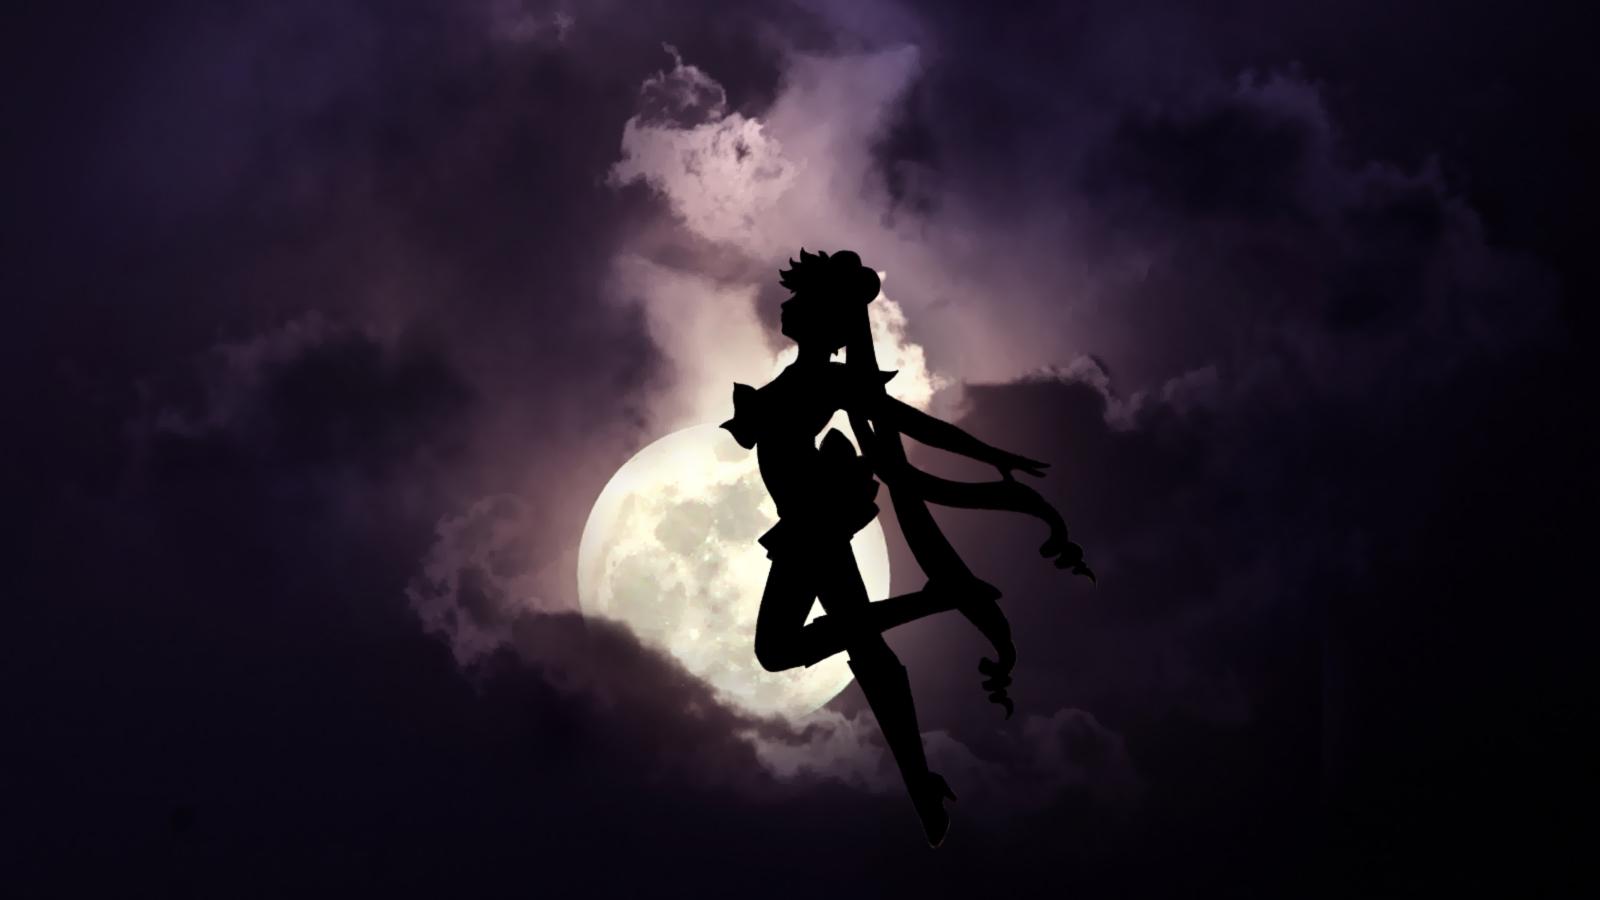 My Sailor Moon Wallpaper by SarahsPlushNStuff My Sailor Moon Wallpaper by SarahsPlushNStuff